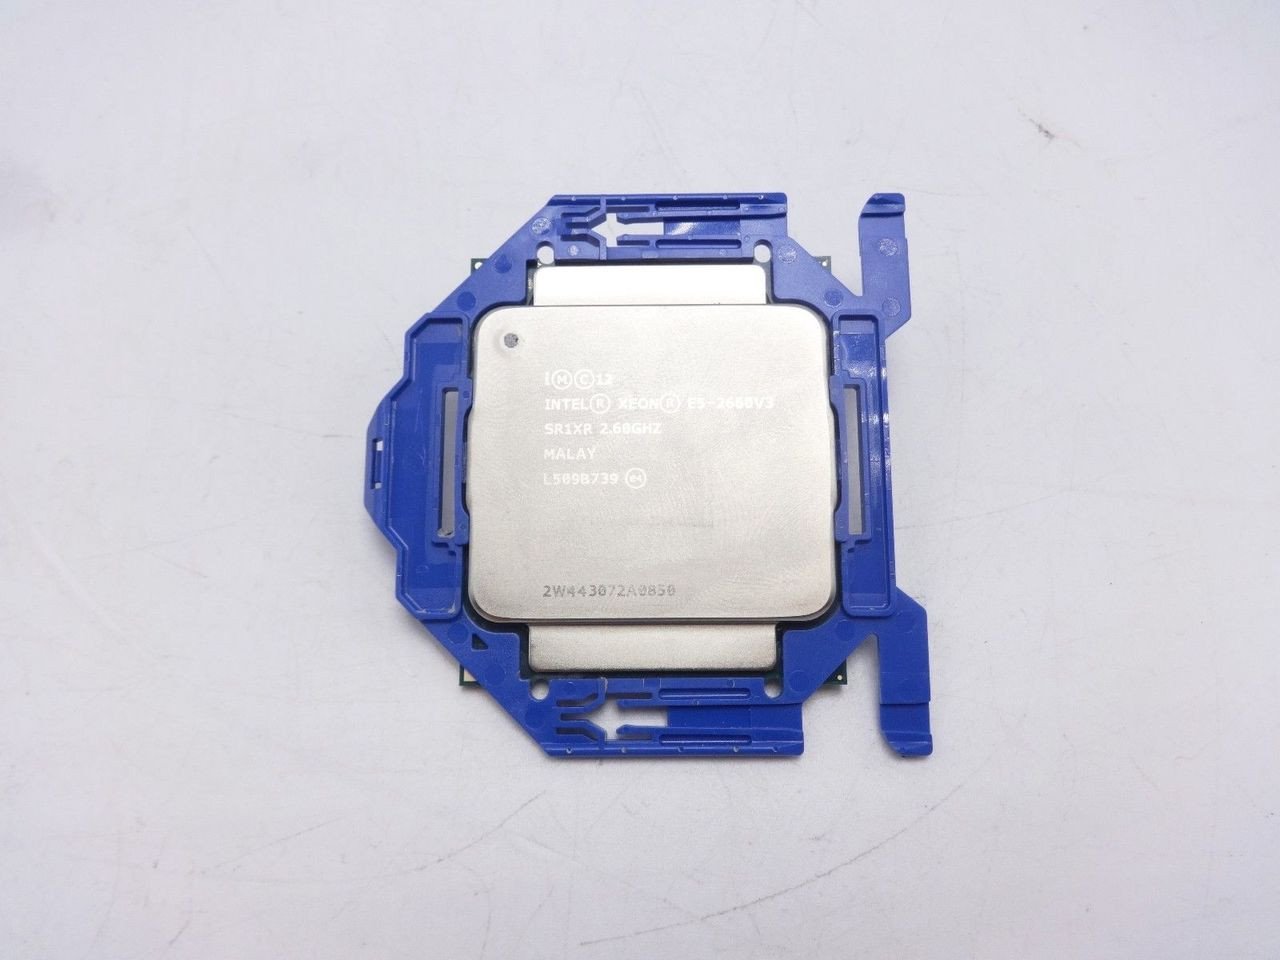 SR1XR Intel E5-2660v3 2.6GHZ 10C Processor E5-2660V3